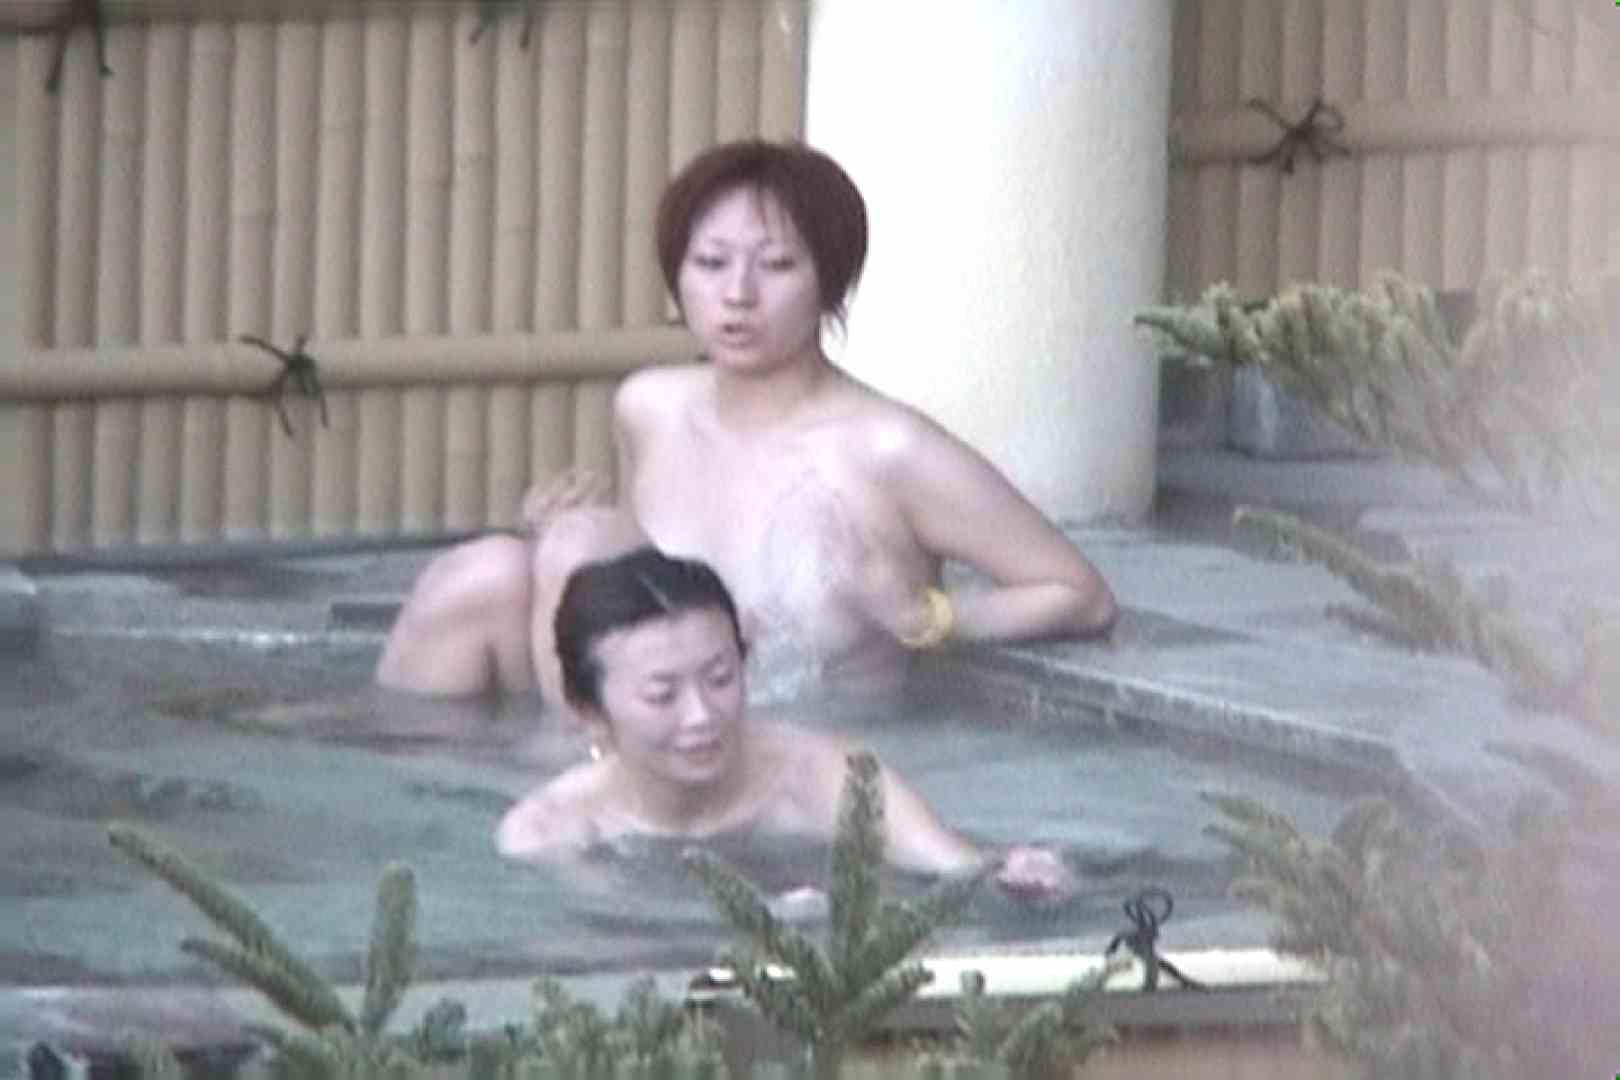 Aquaな露天風呂Vol.561 露天 のぞき動画キャプチャ 80pic 79